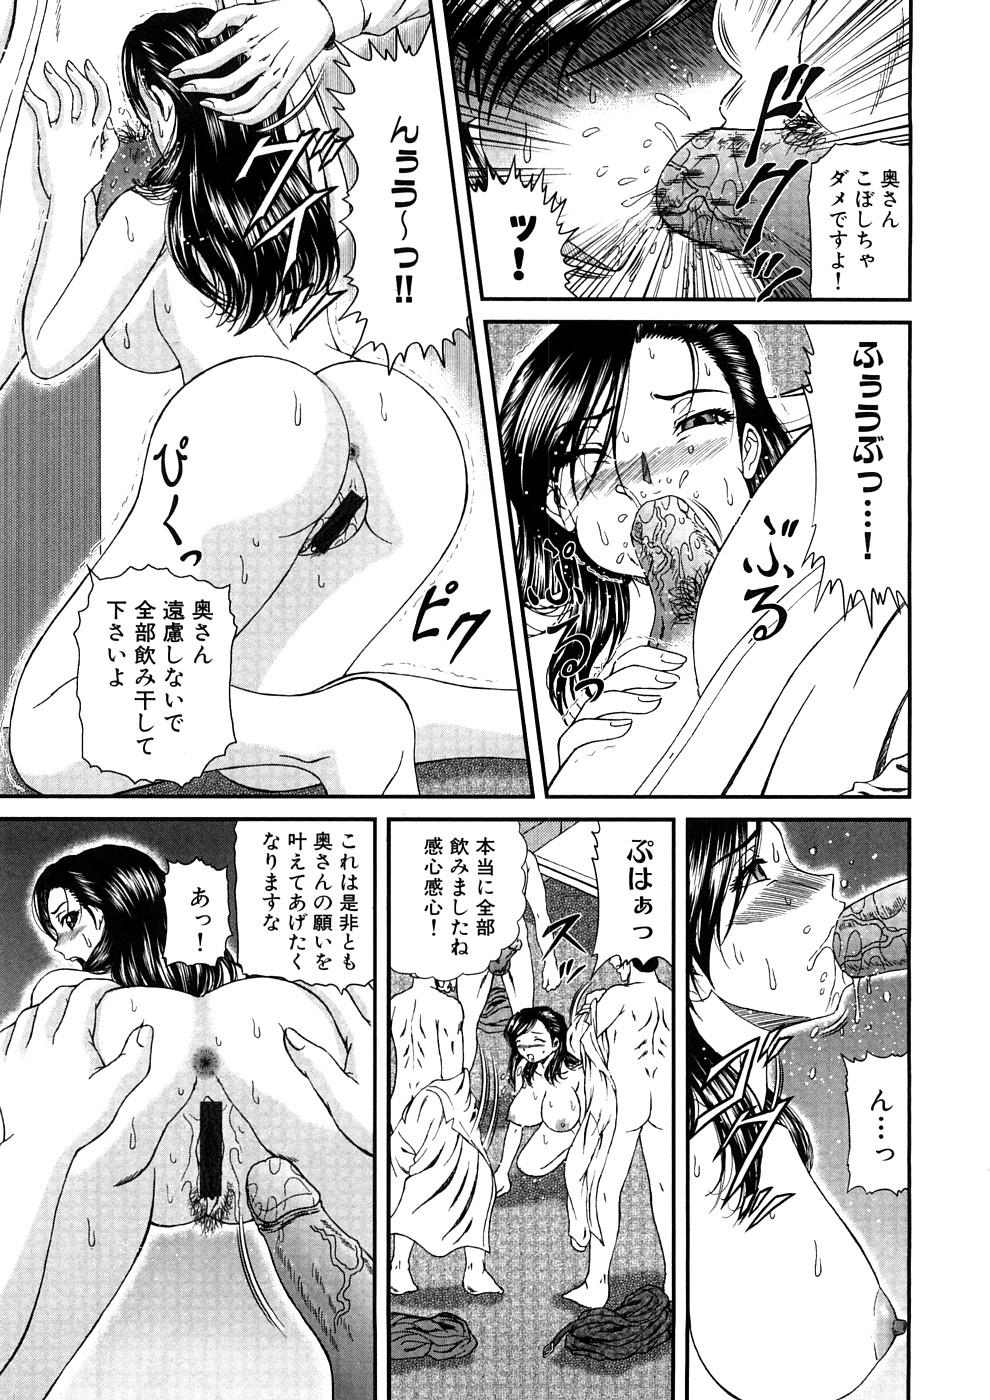 Geki Yaba Anthology Vol. 1 - Naka ni Dashite yo 147